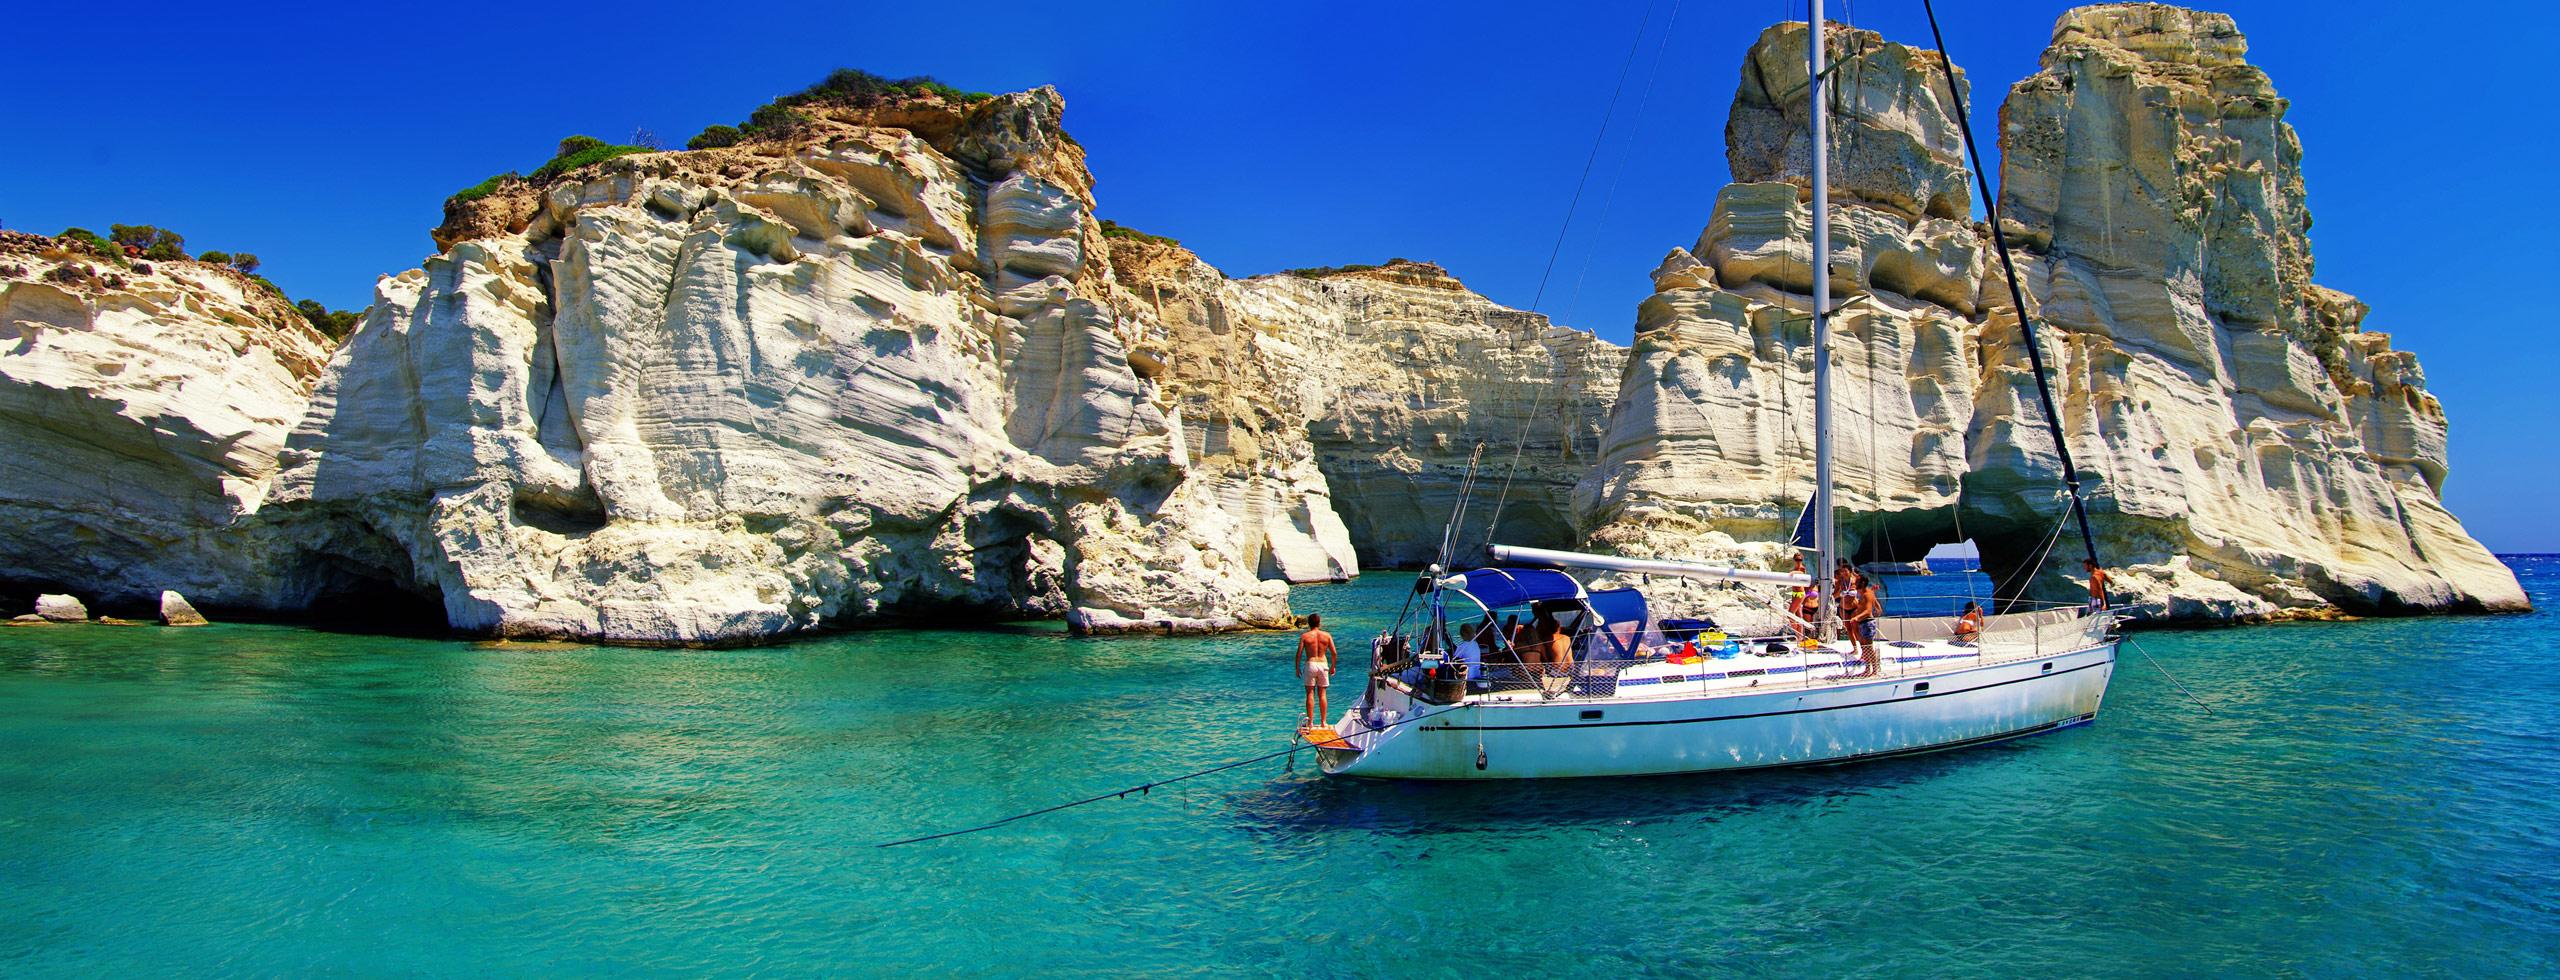 Greek Islands Sailing Vacation, Yacht Charter Greece